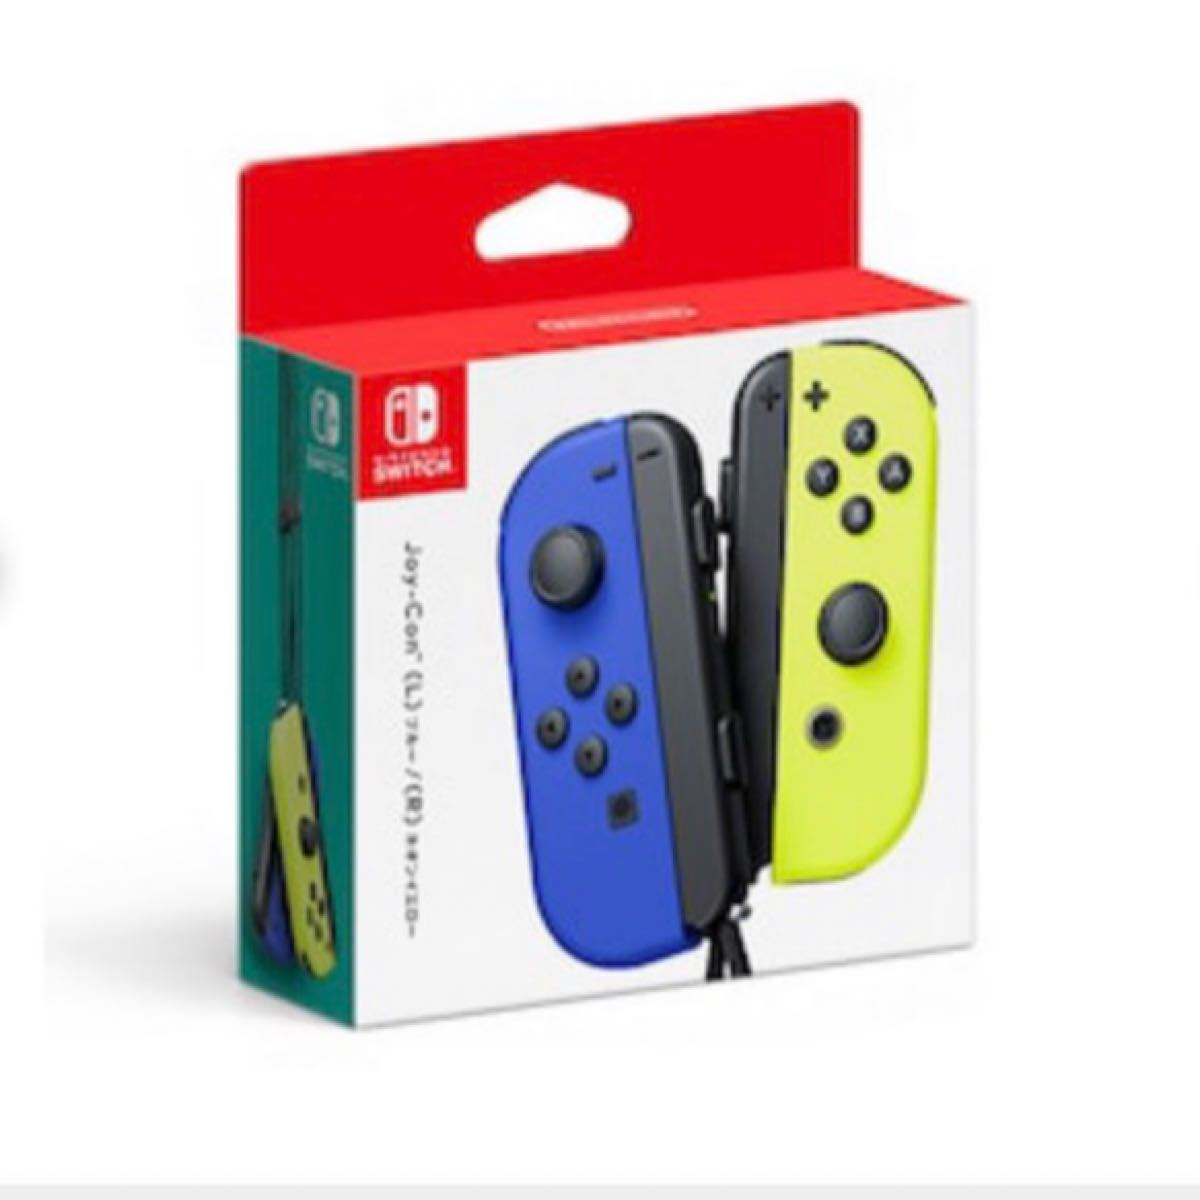 Joy-Con(L) ブルー/(R) ネオンイエロー  Nintendo Switch ジョイコン Joy-Con